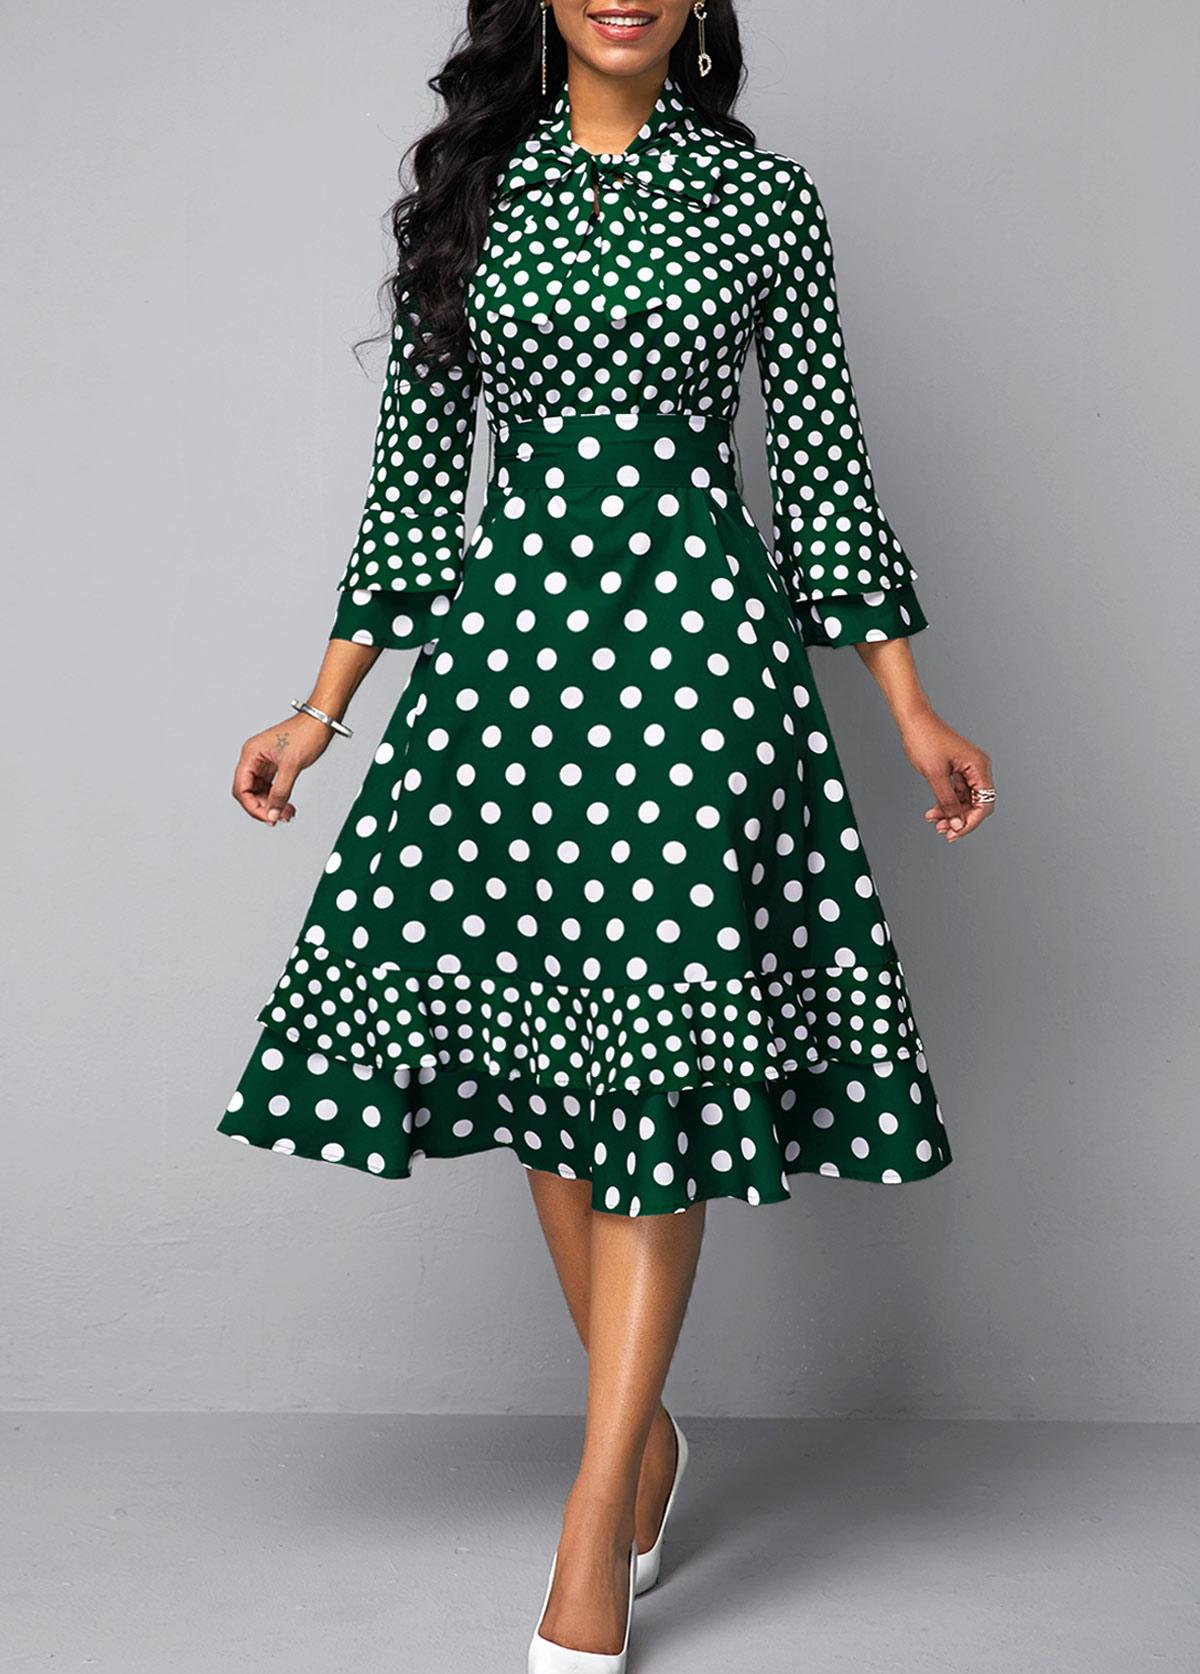 Bowknot Detail Layered Bell Sleeve Dot Print Dress